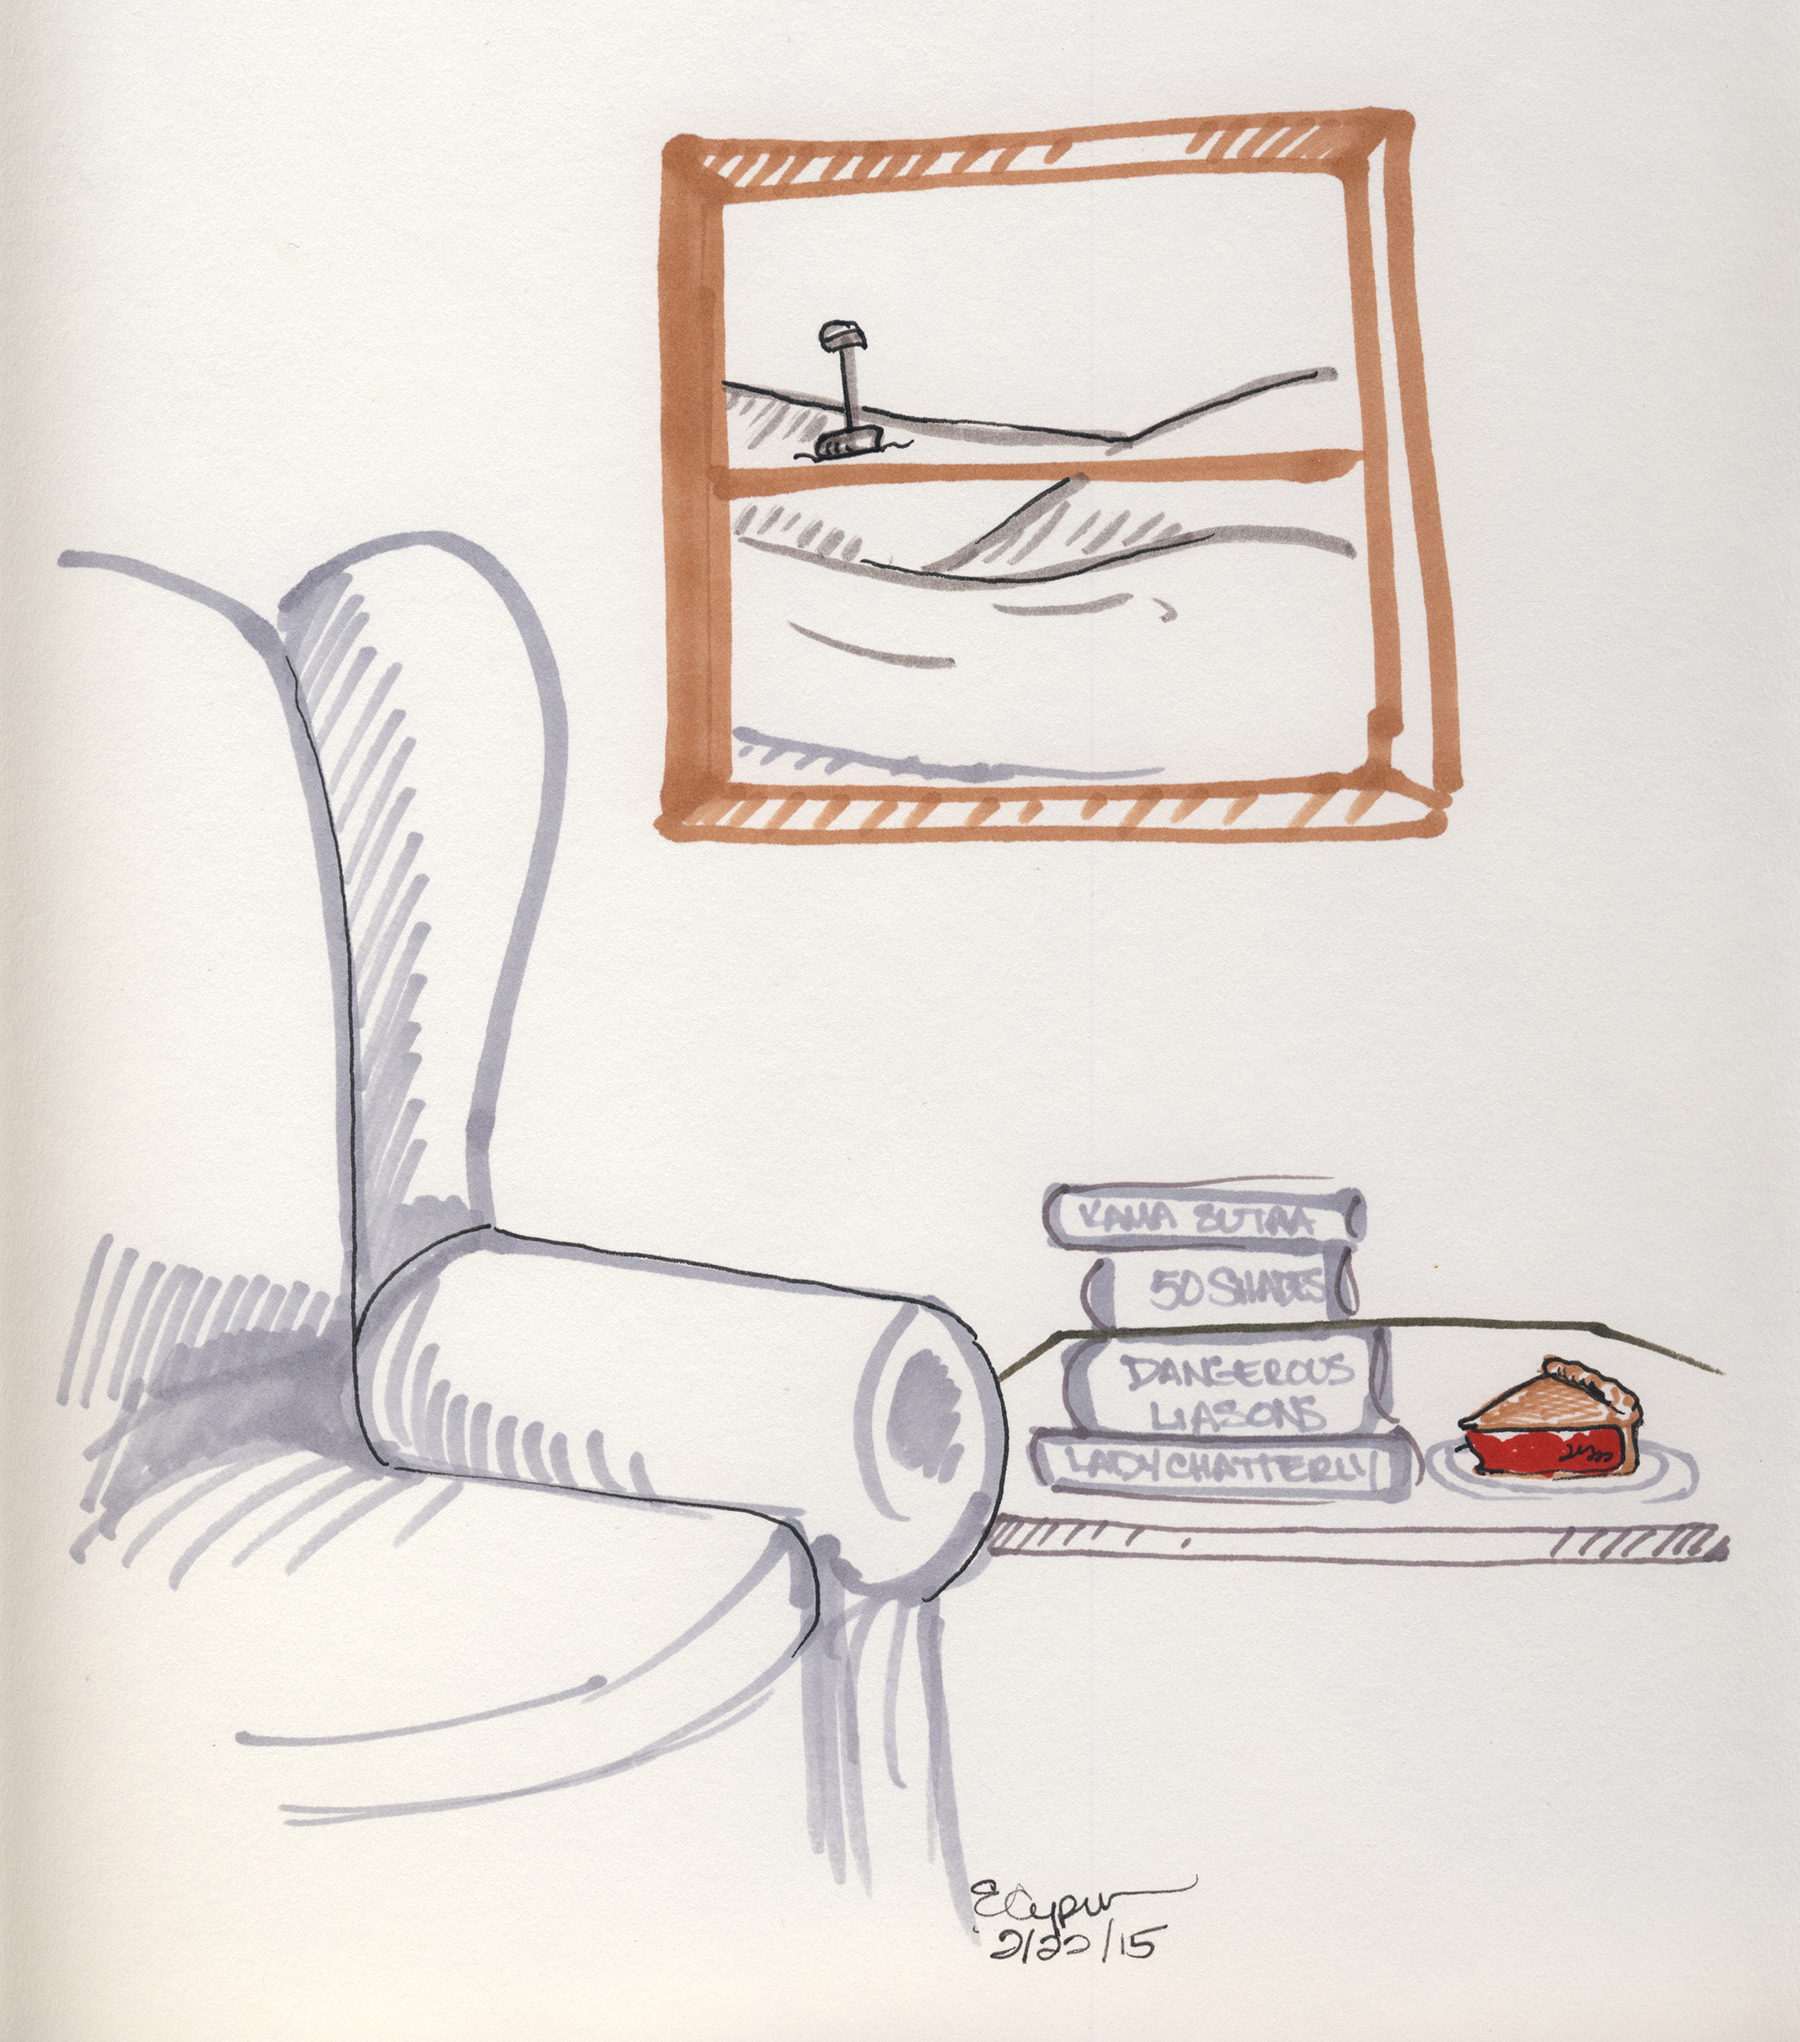 Tom illustrated